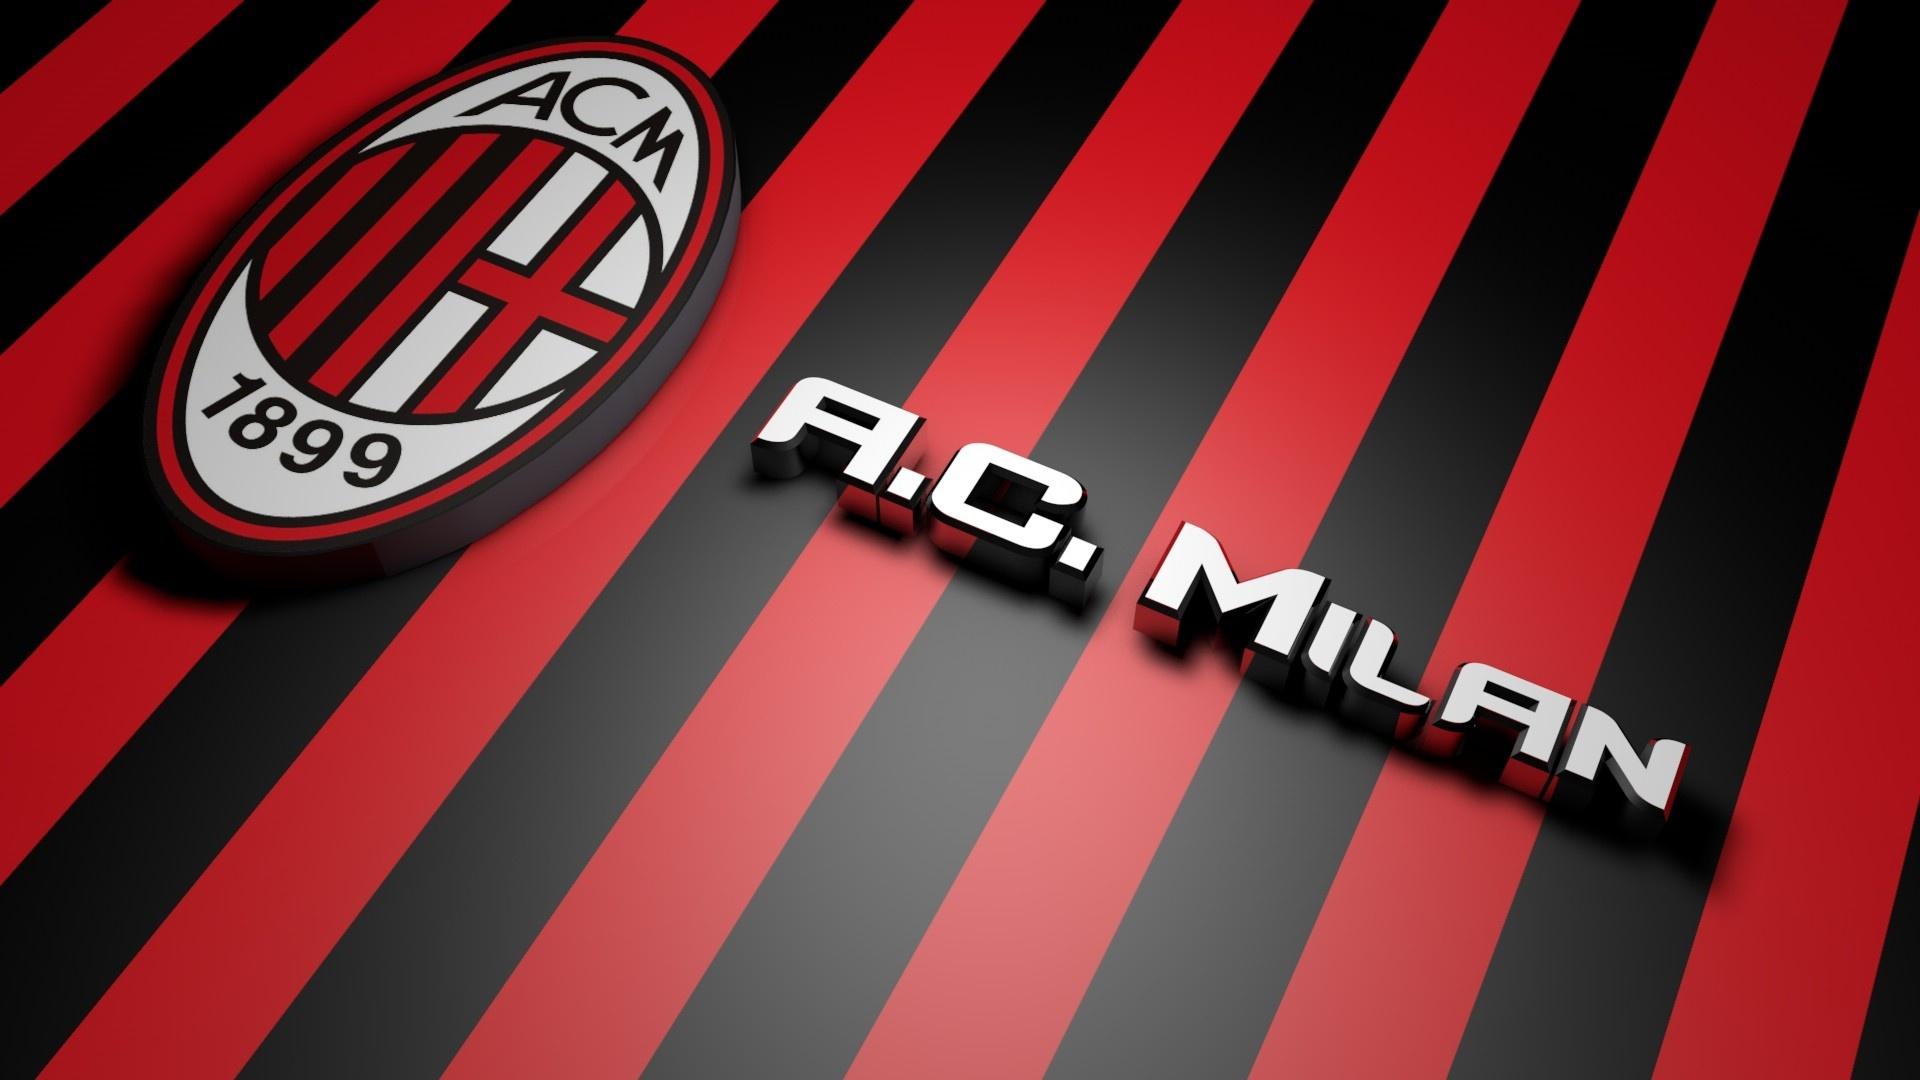 AC Milan Football Logo HD Wallpaper of Football 1920x1080